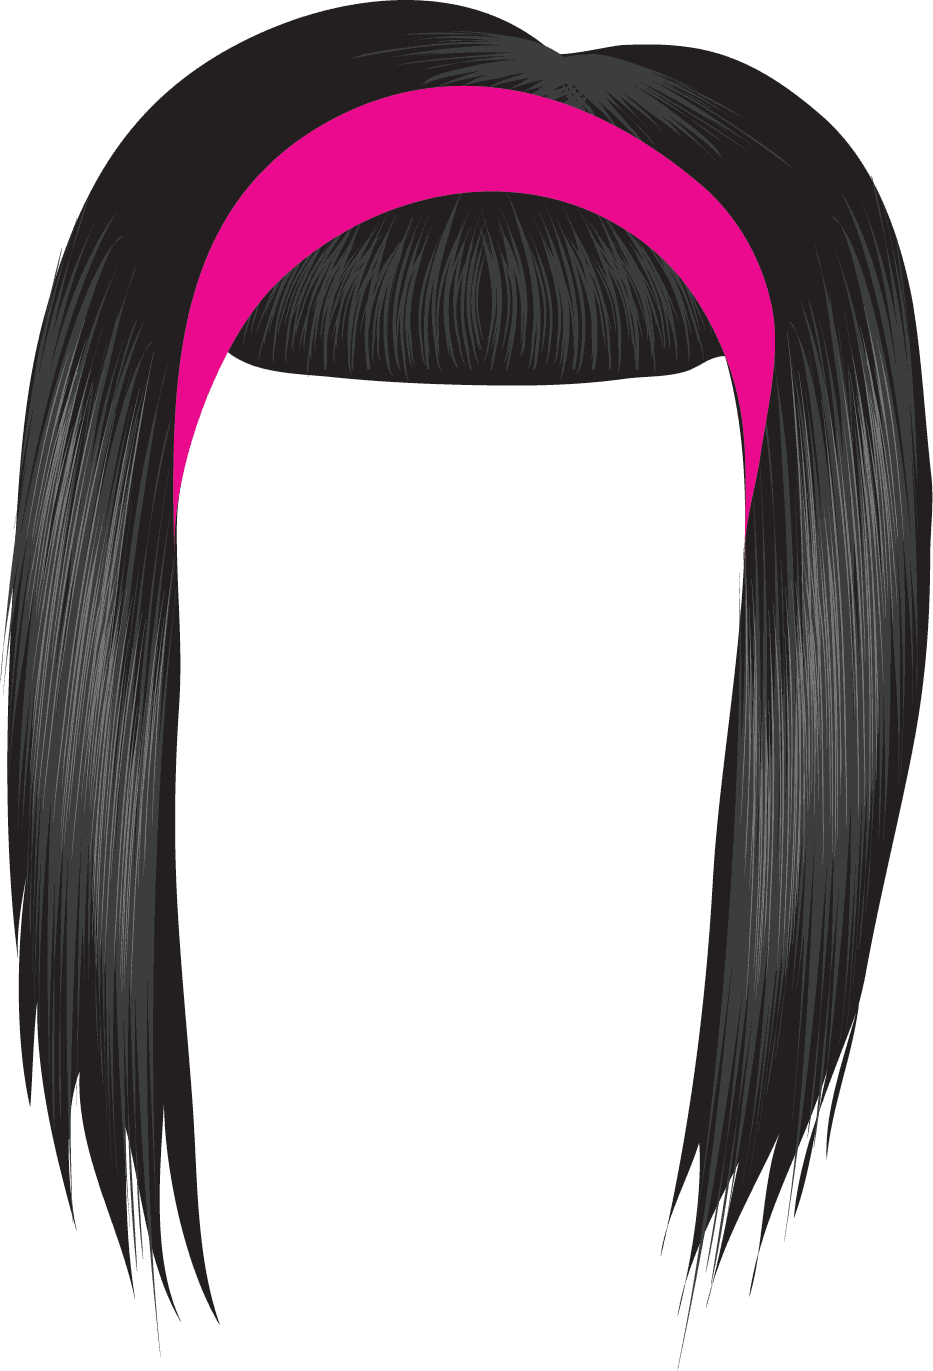 Boy hair wig clipart royalty free library Boy Hair Clipart | Free download best Boy Hair Clipart on ClipArtMag.com royalty free library